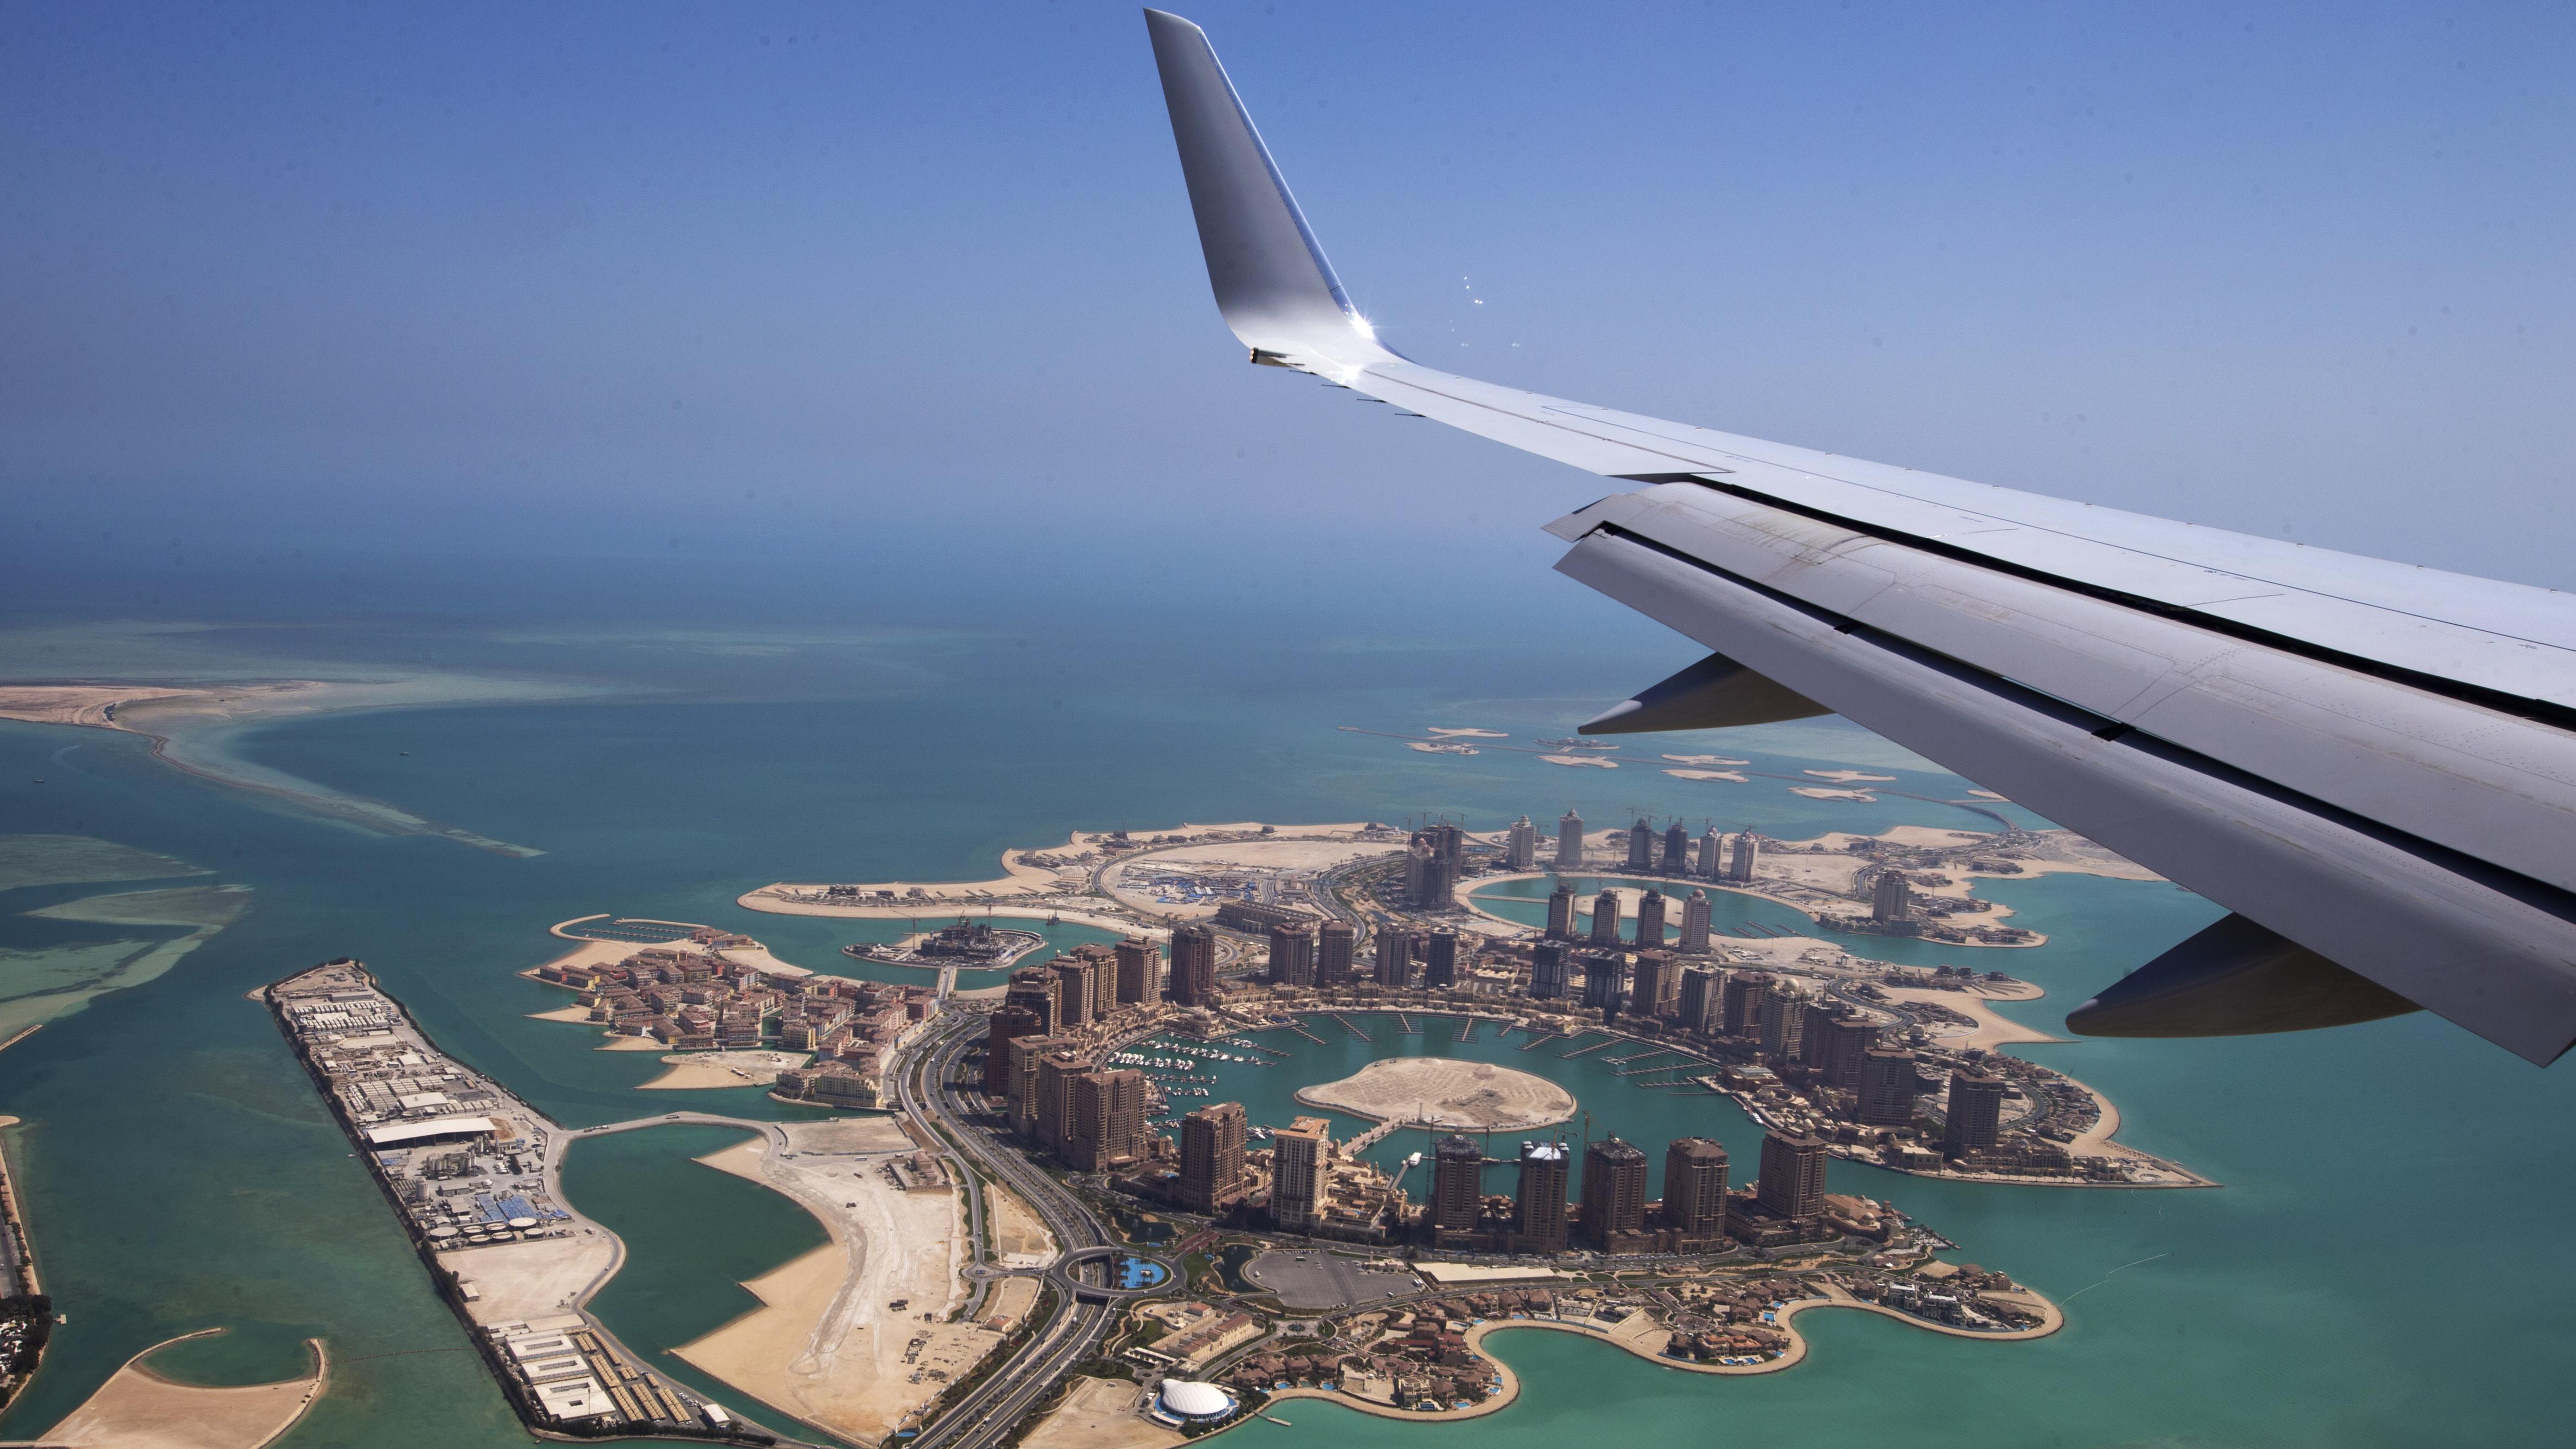 Aerial shot of Doha, Qatar